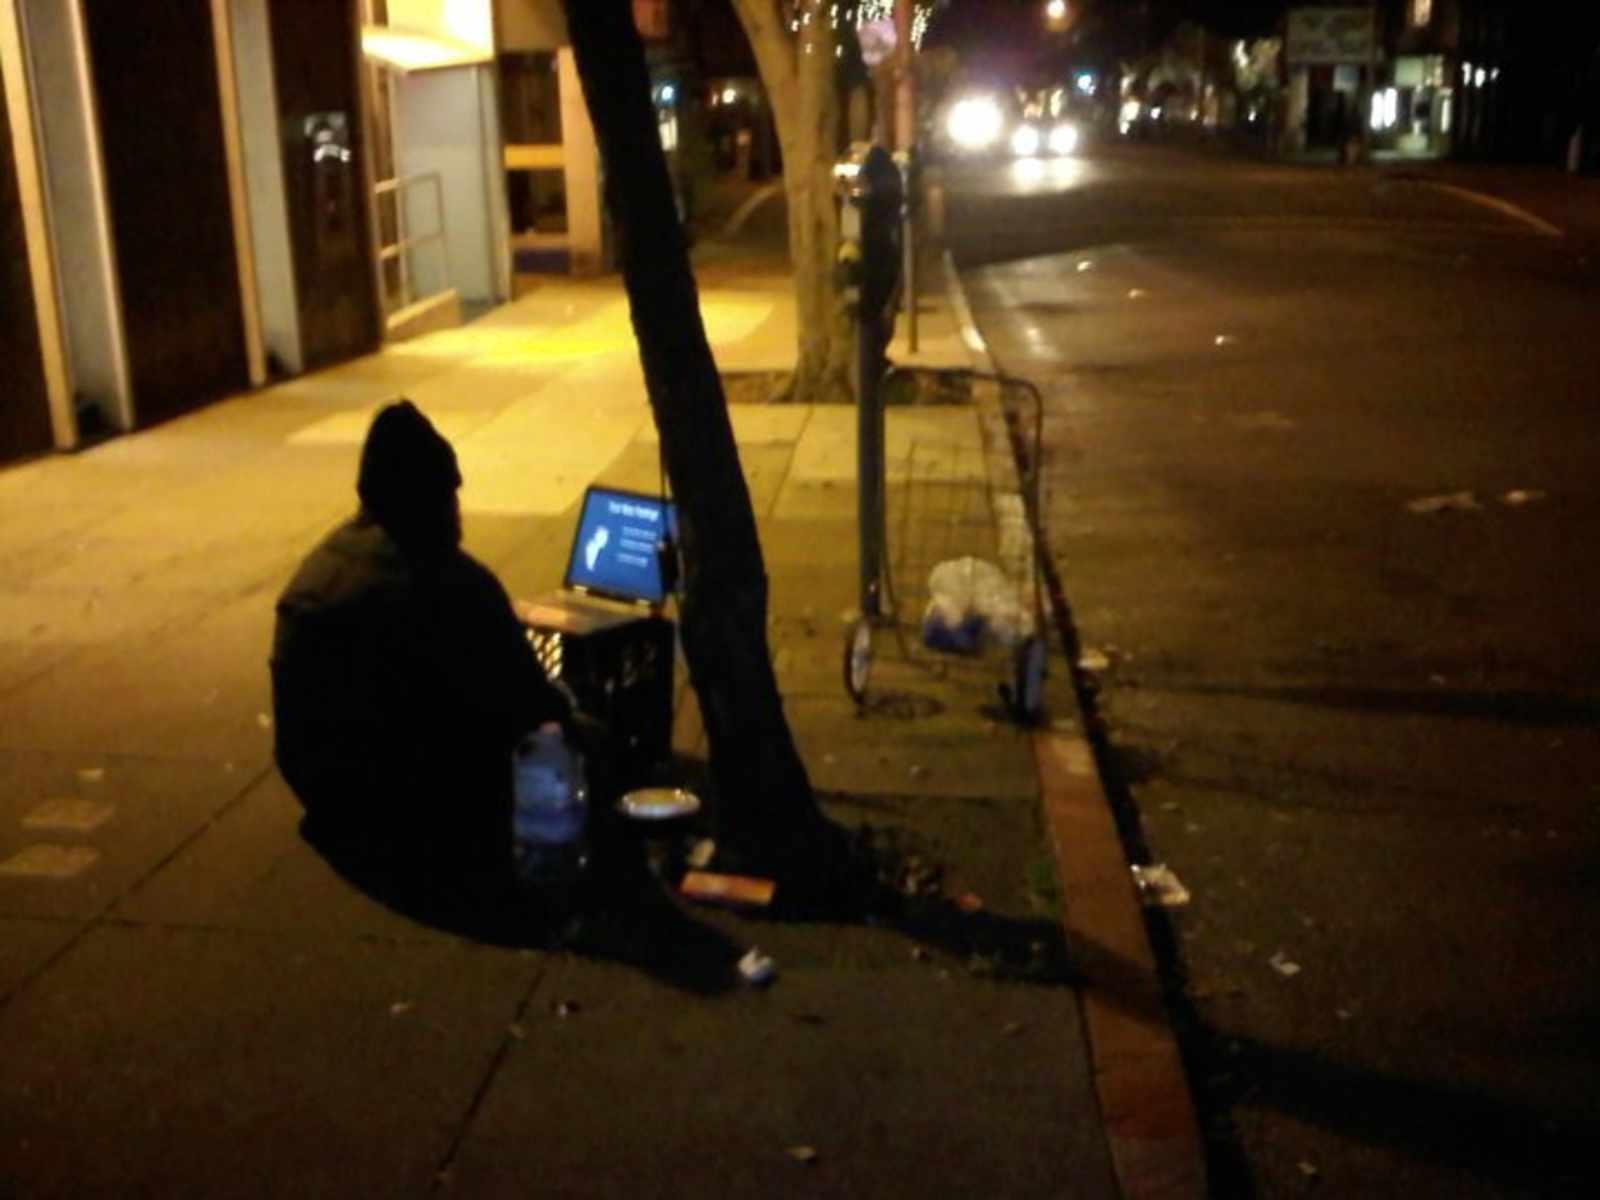 sf-homeless-man-laptop.jpg